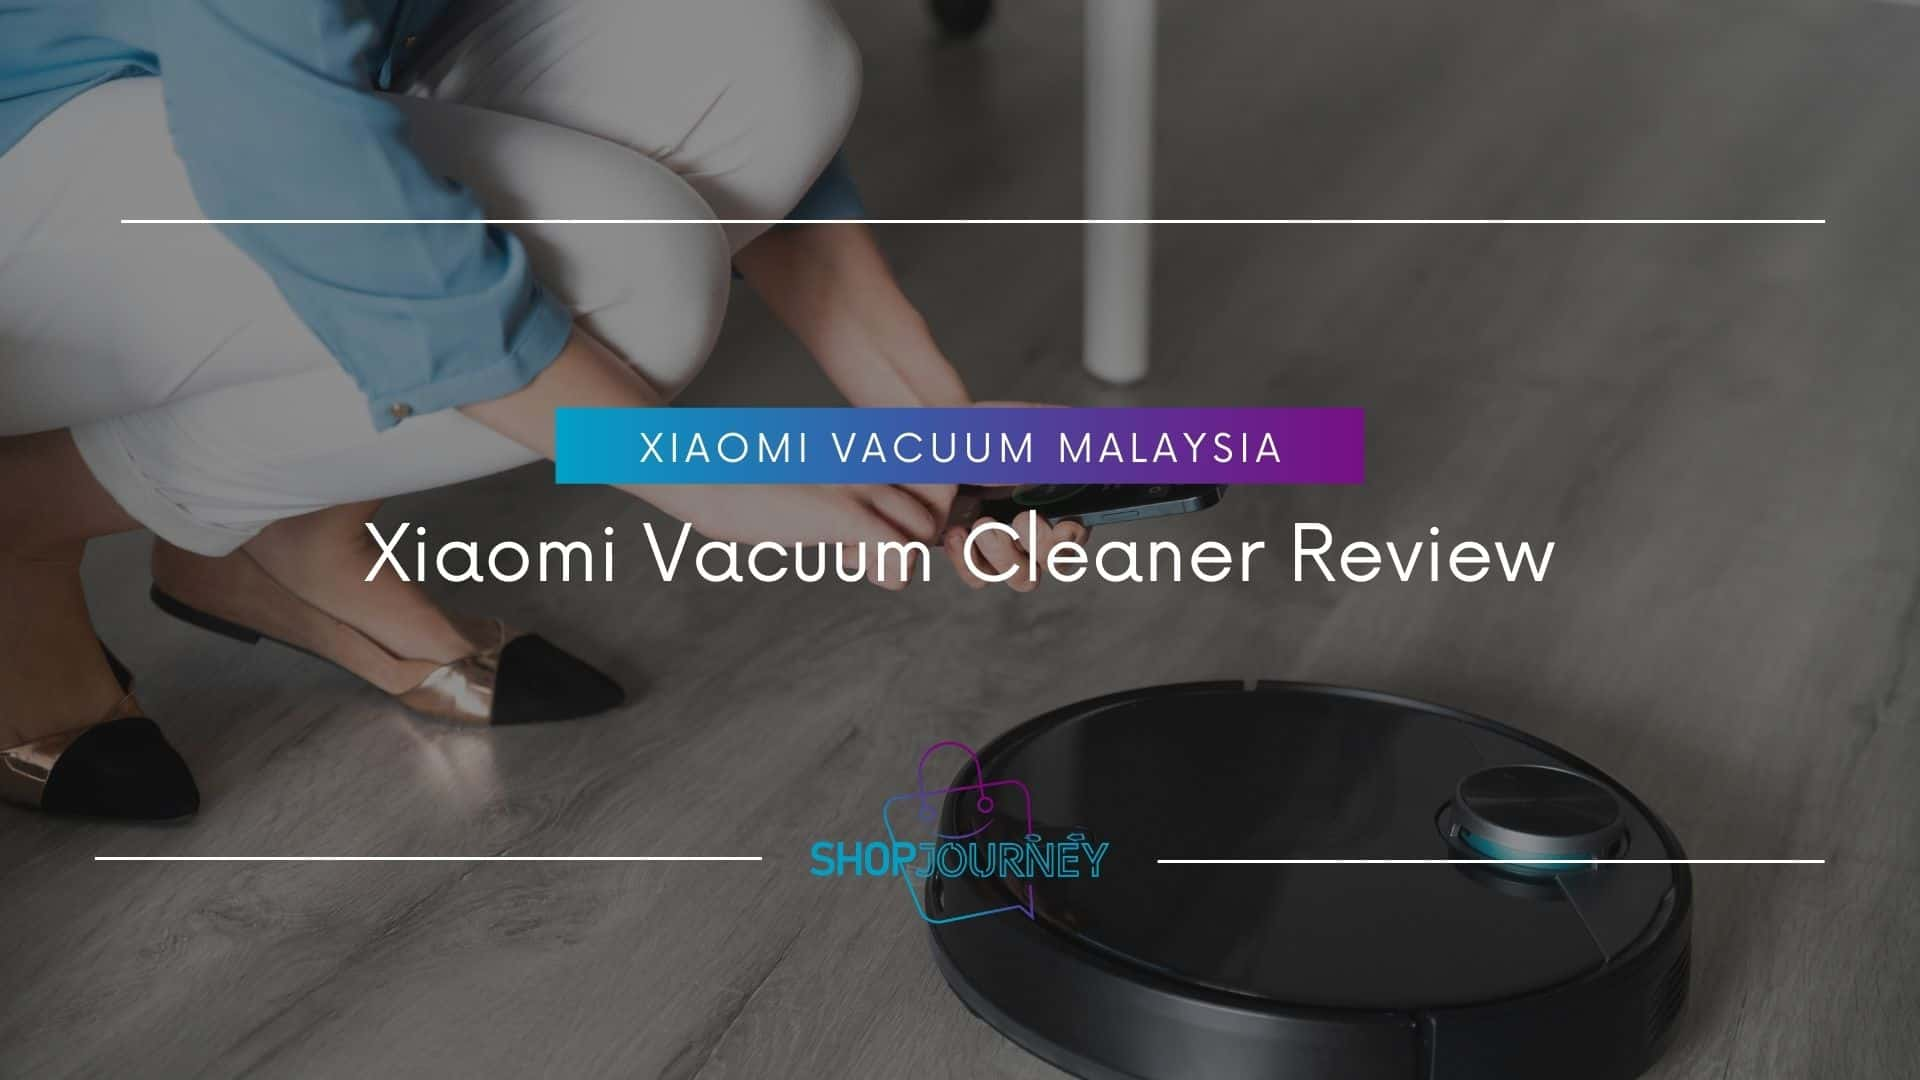 Xiaomi Vacuum Cleaner Review - Shop Journey